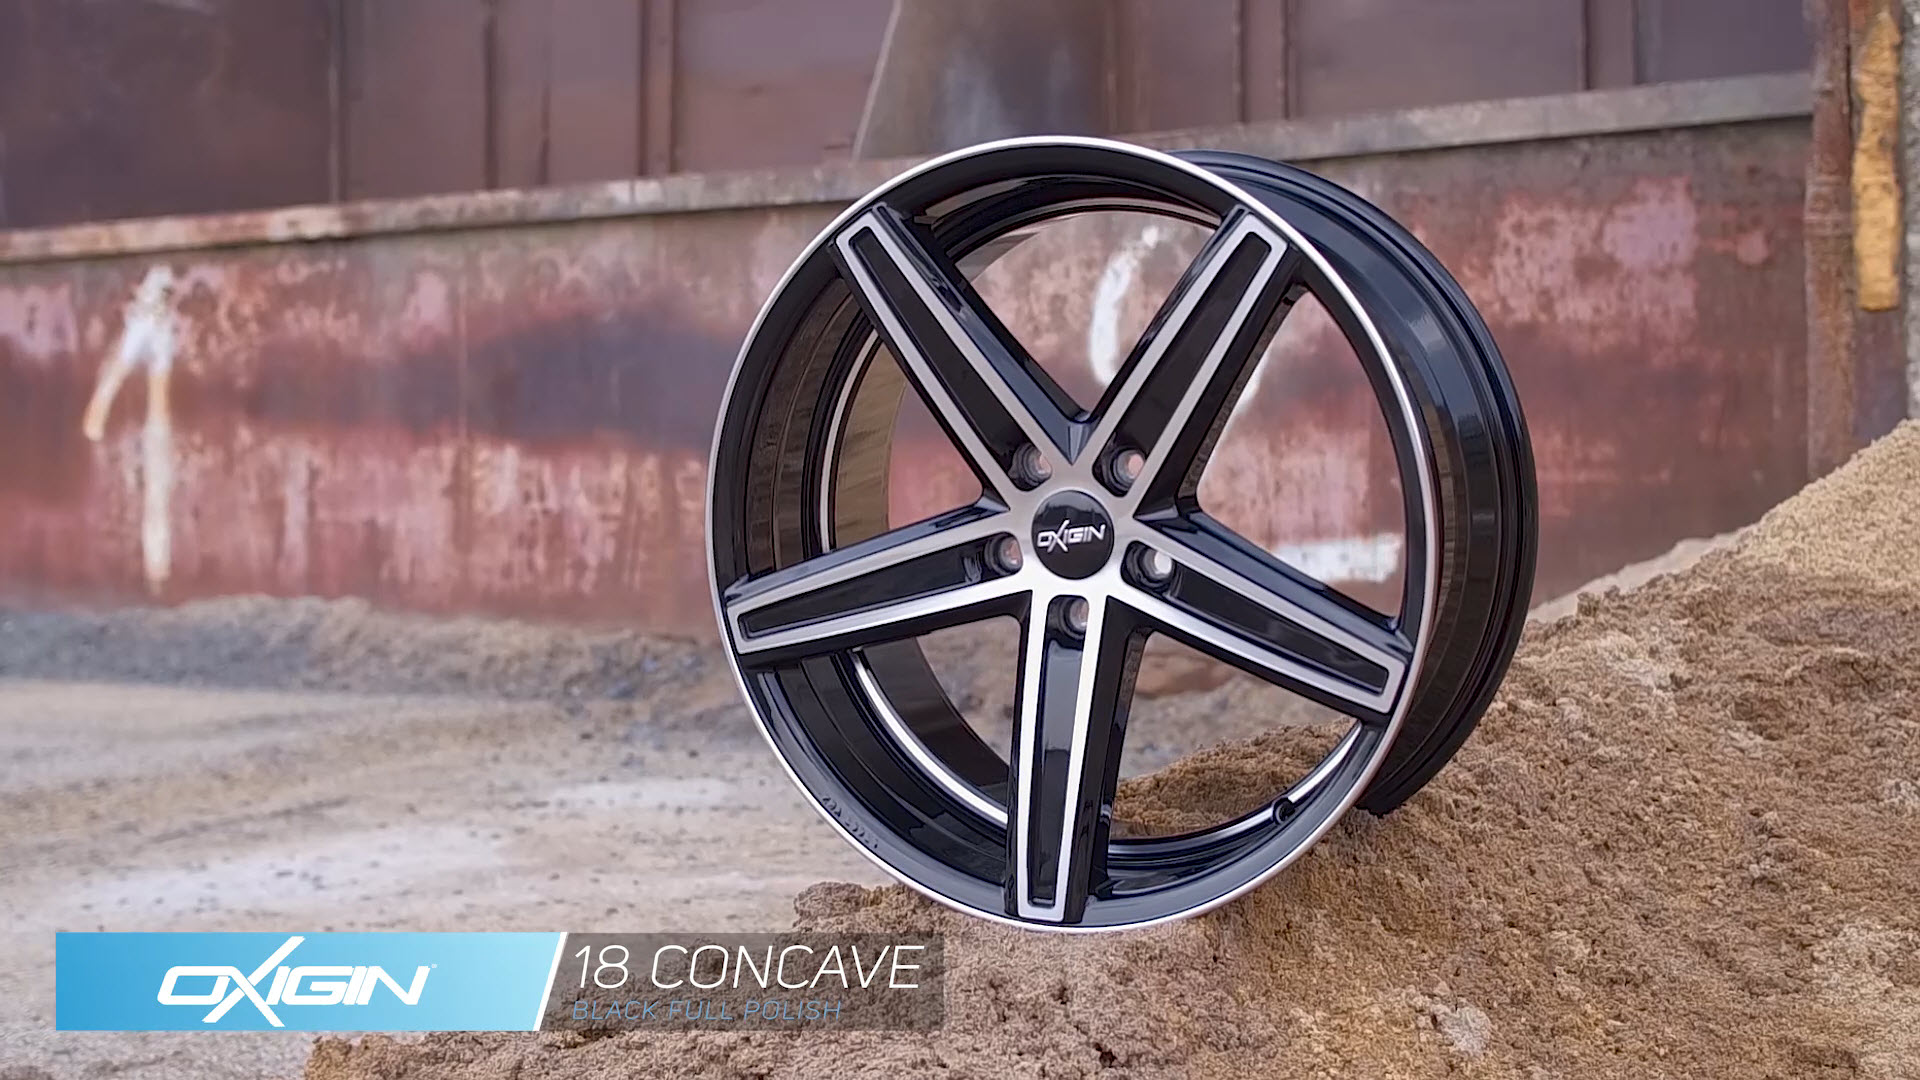 OX 18 Concave Black Full Polish und Ambiente